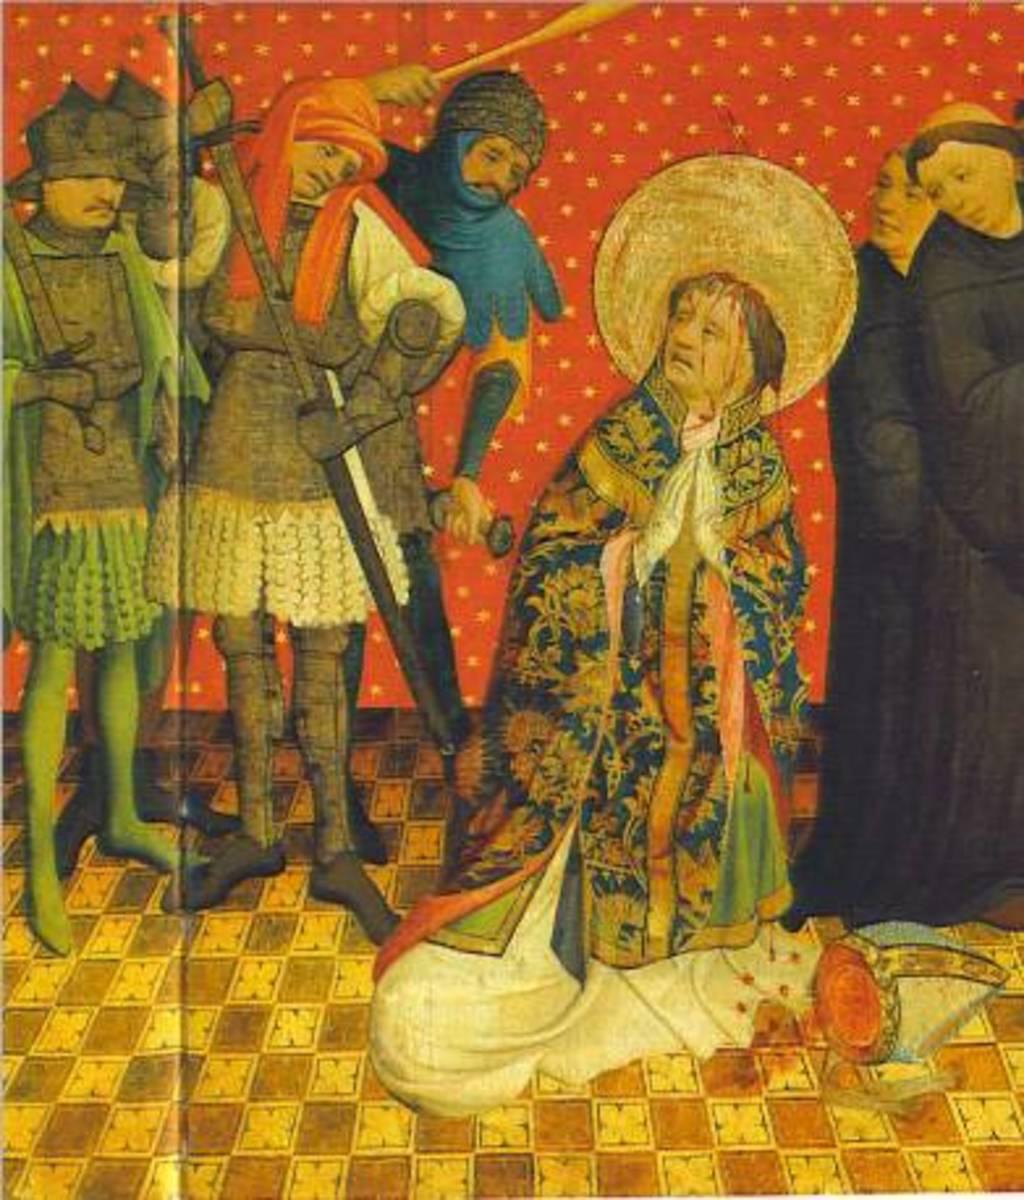 Thomas Becket, Archbishop of Canterbury